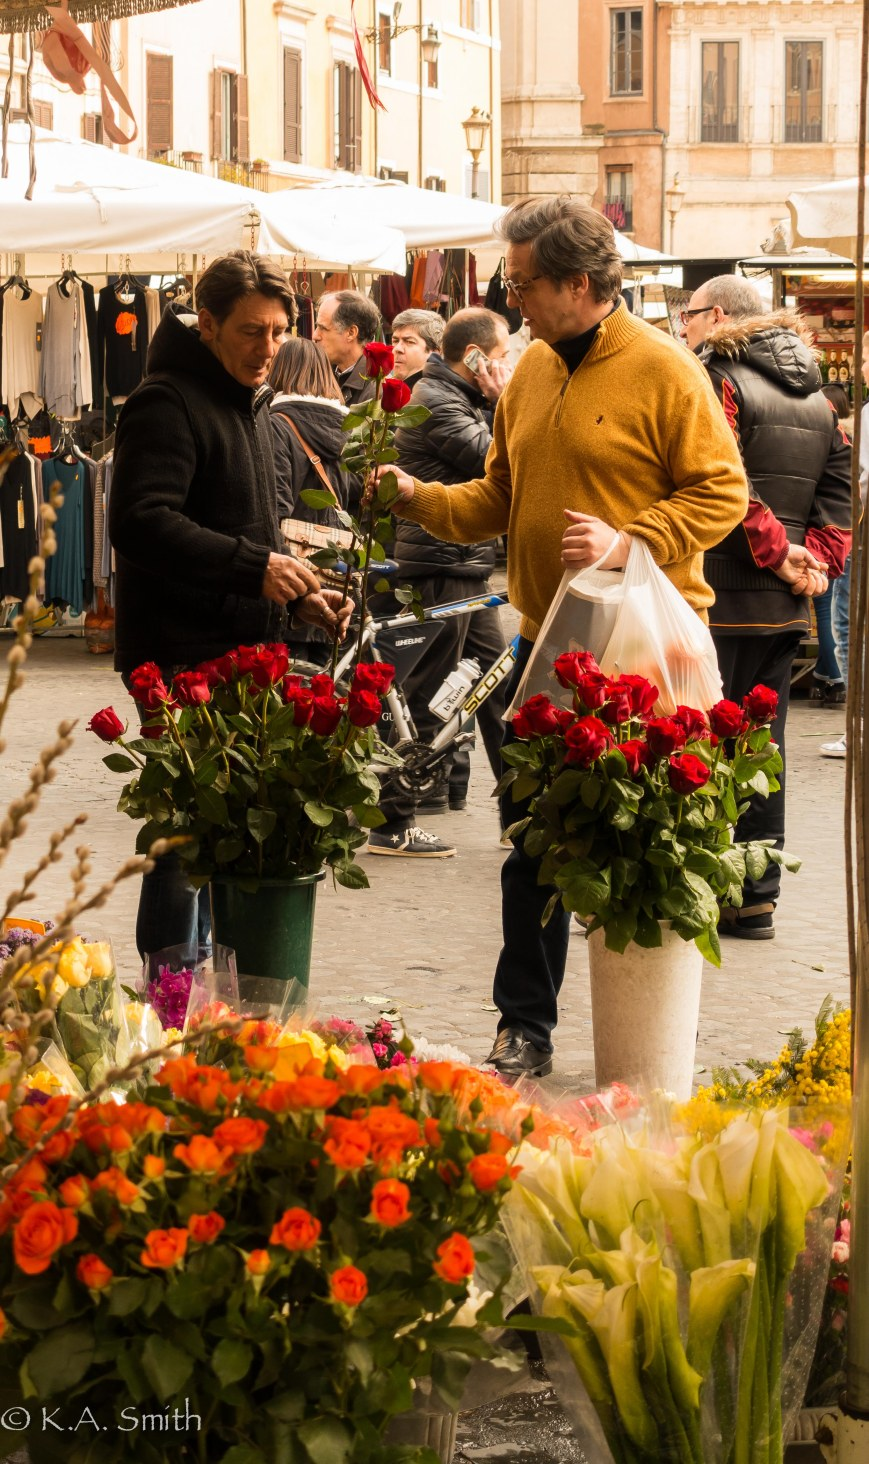 Saint Valentine's Day transactions